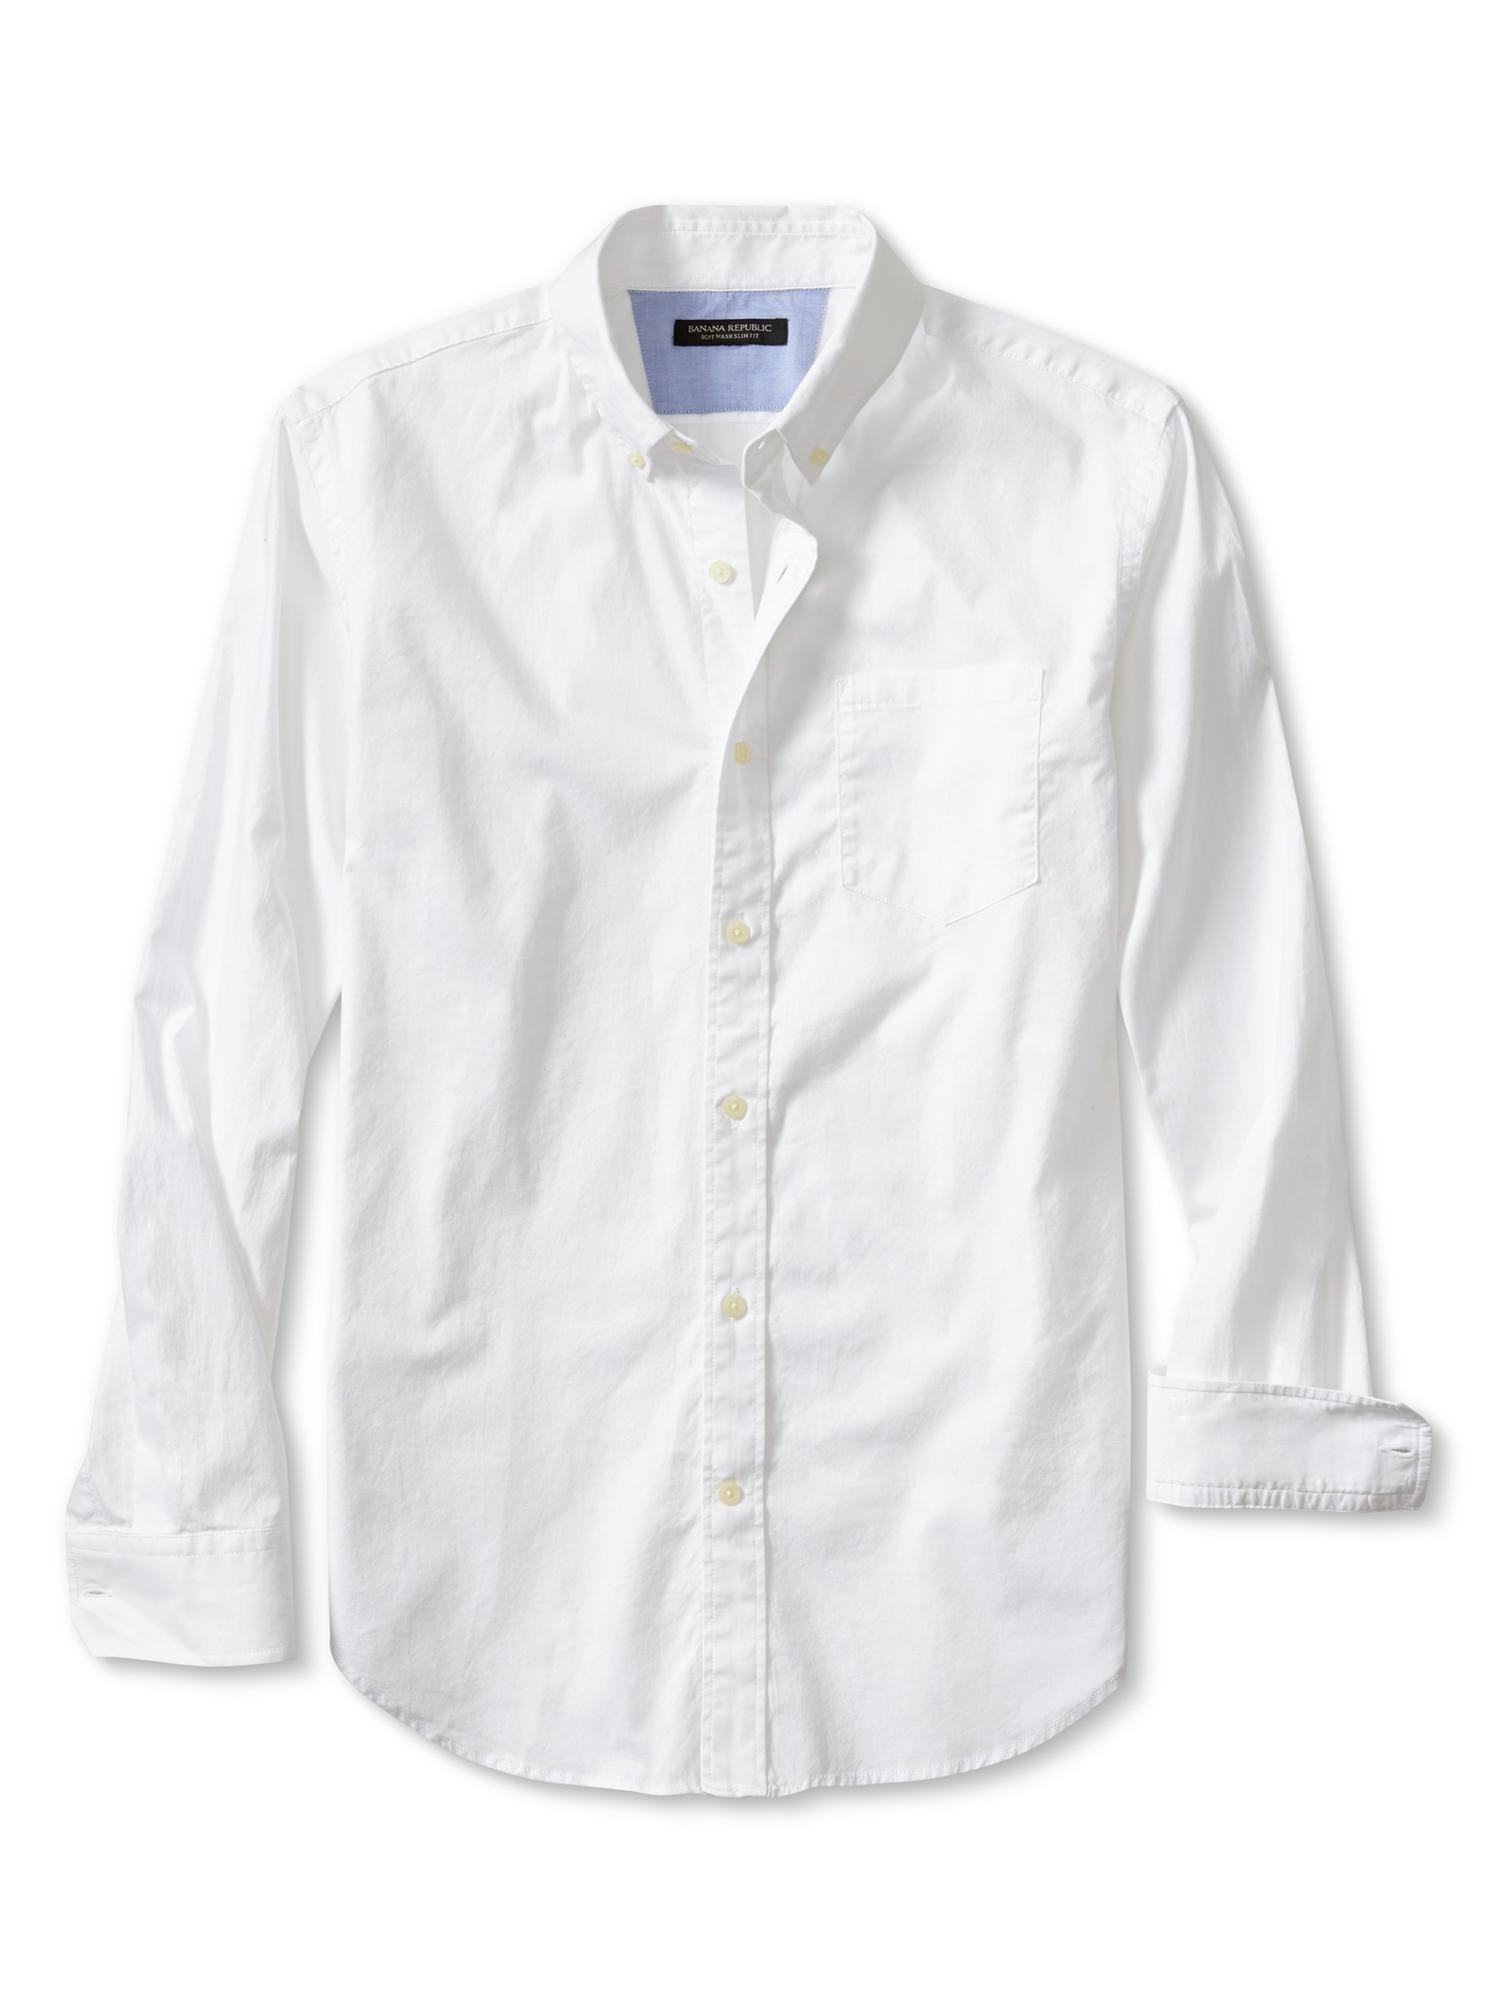 Banana republic slim fit soft wash button down shirt in for Slim fit white button down shirt